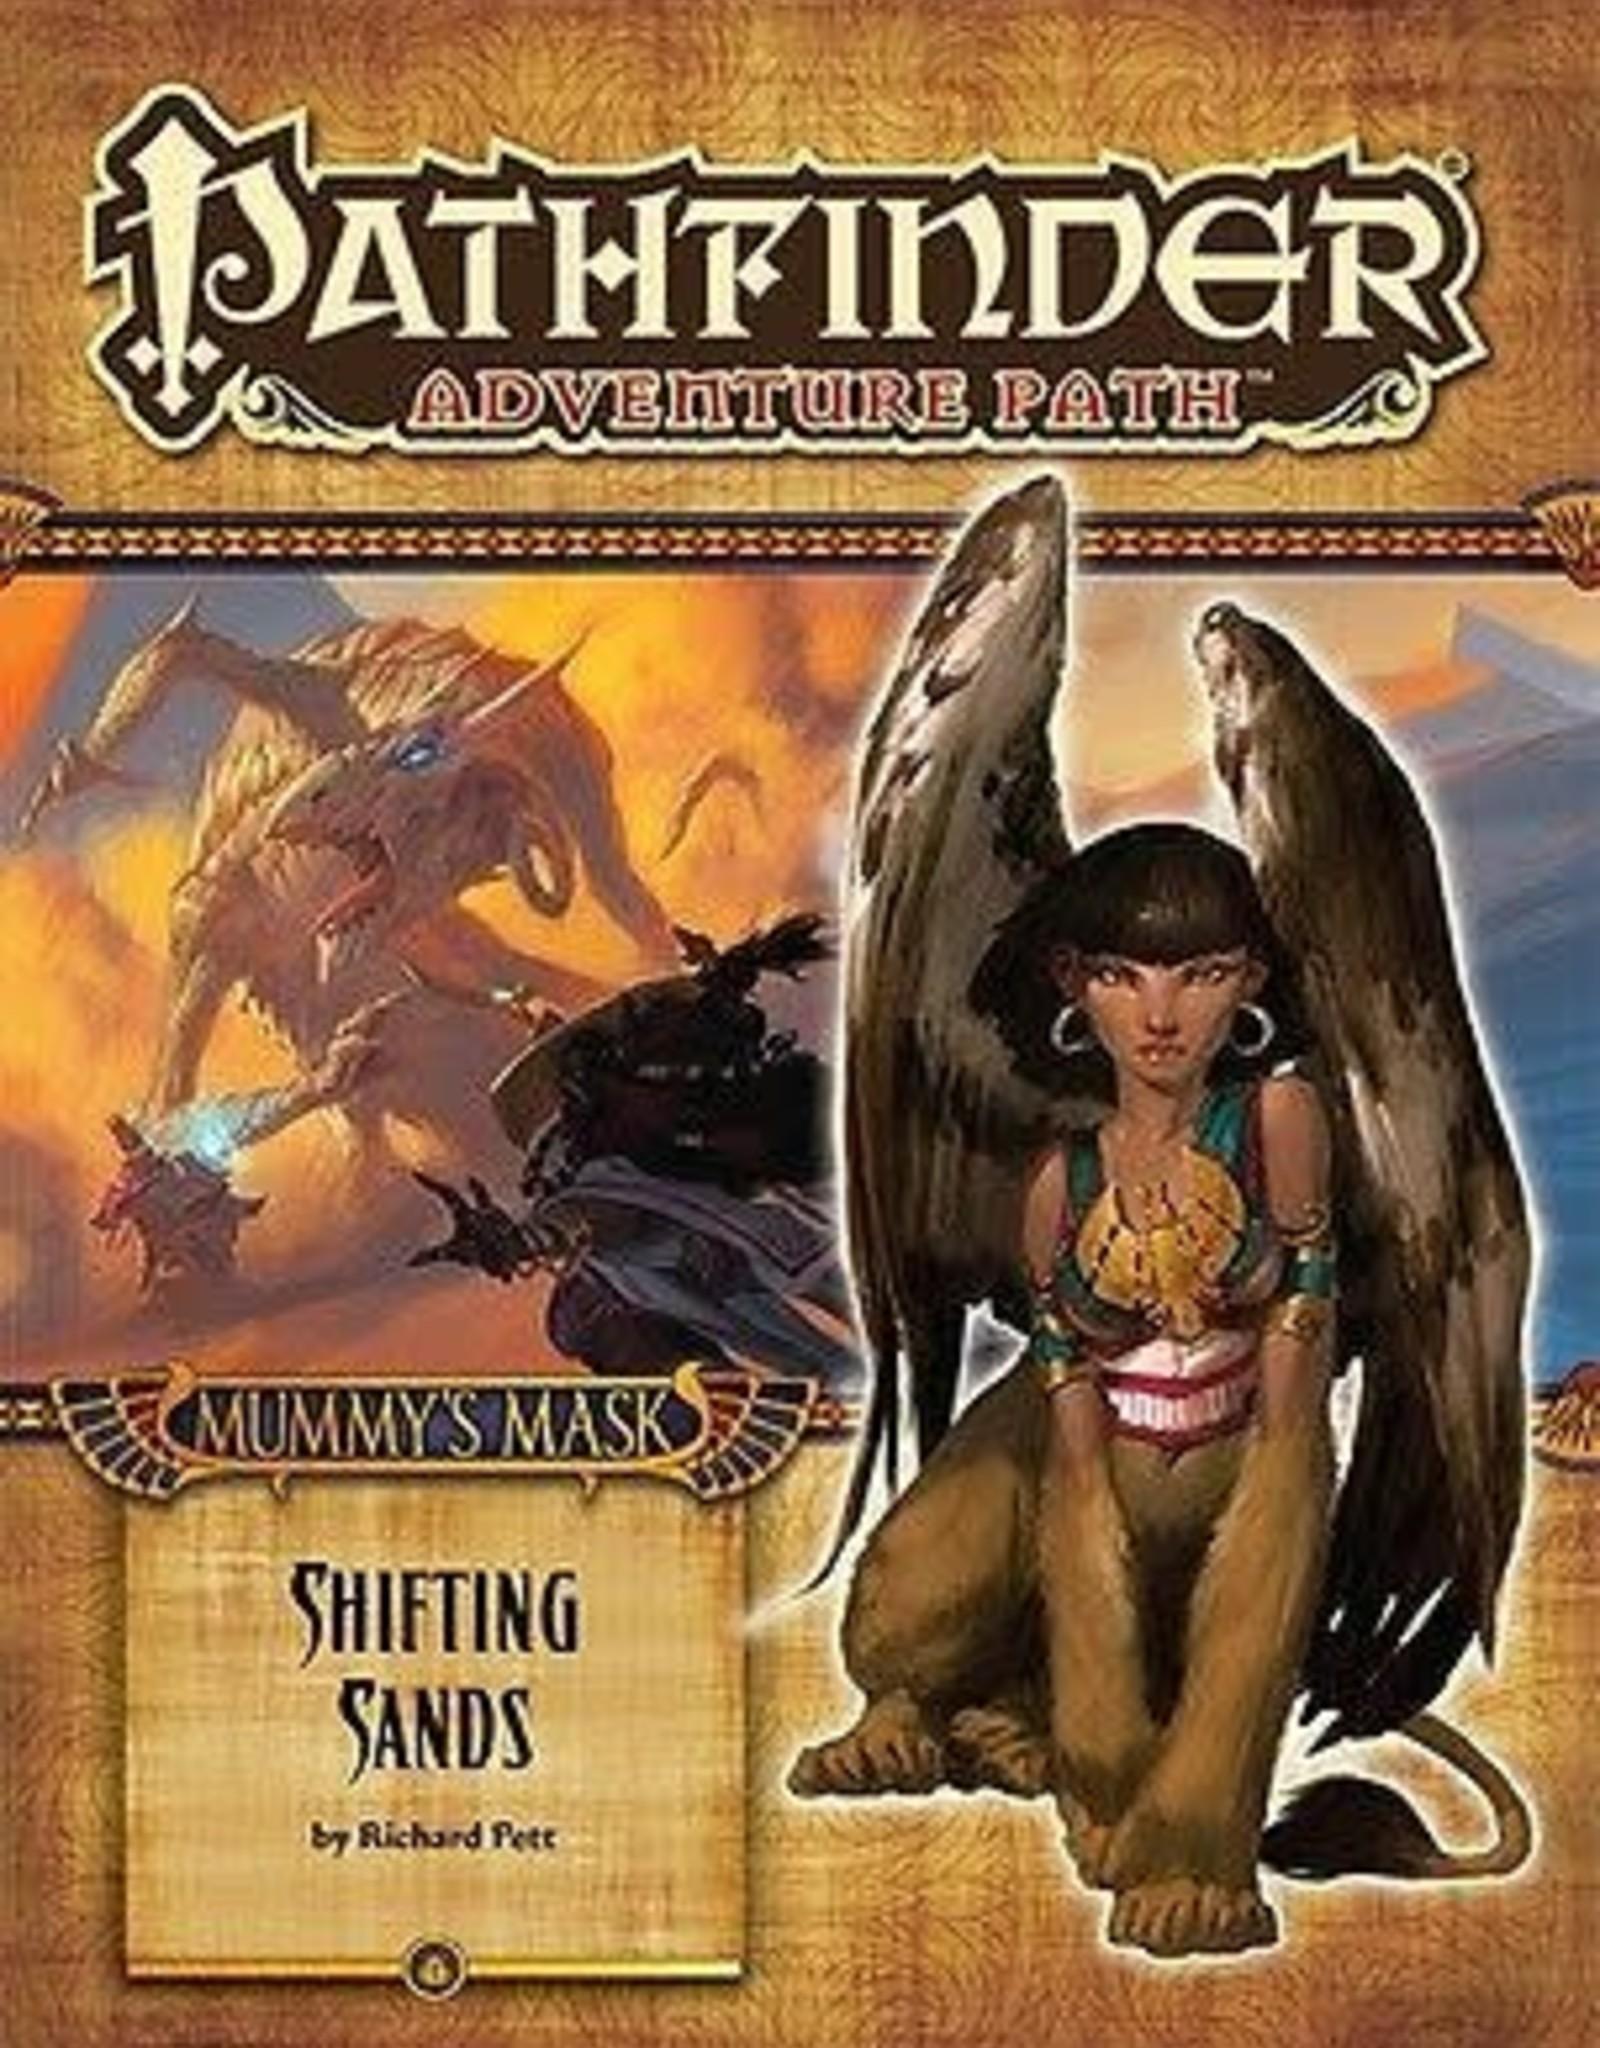 Pathfinder: 081 Mummy's Mask - Shifting Sands